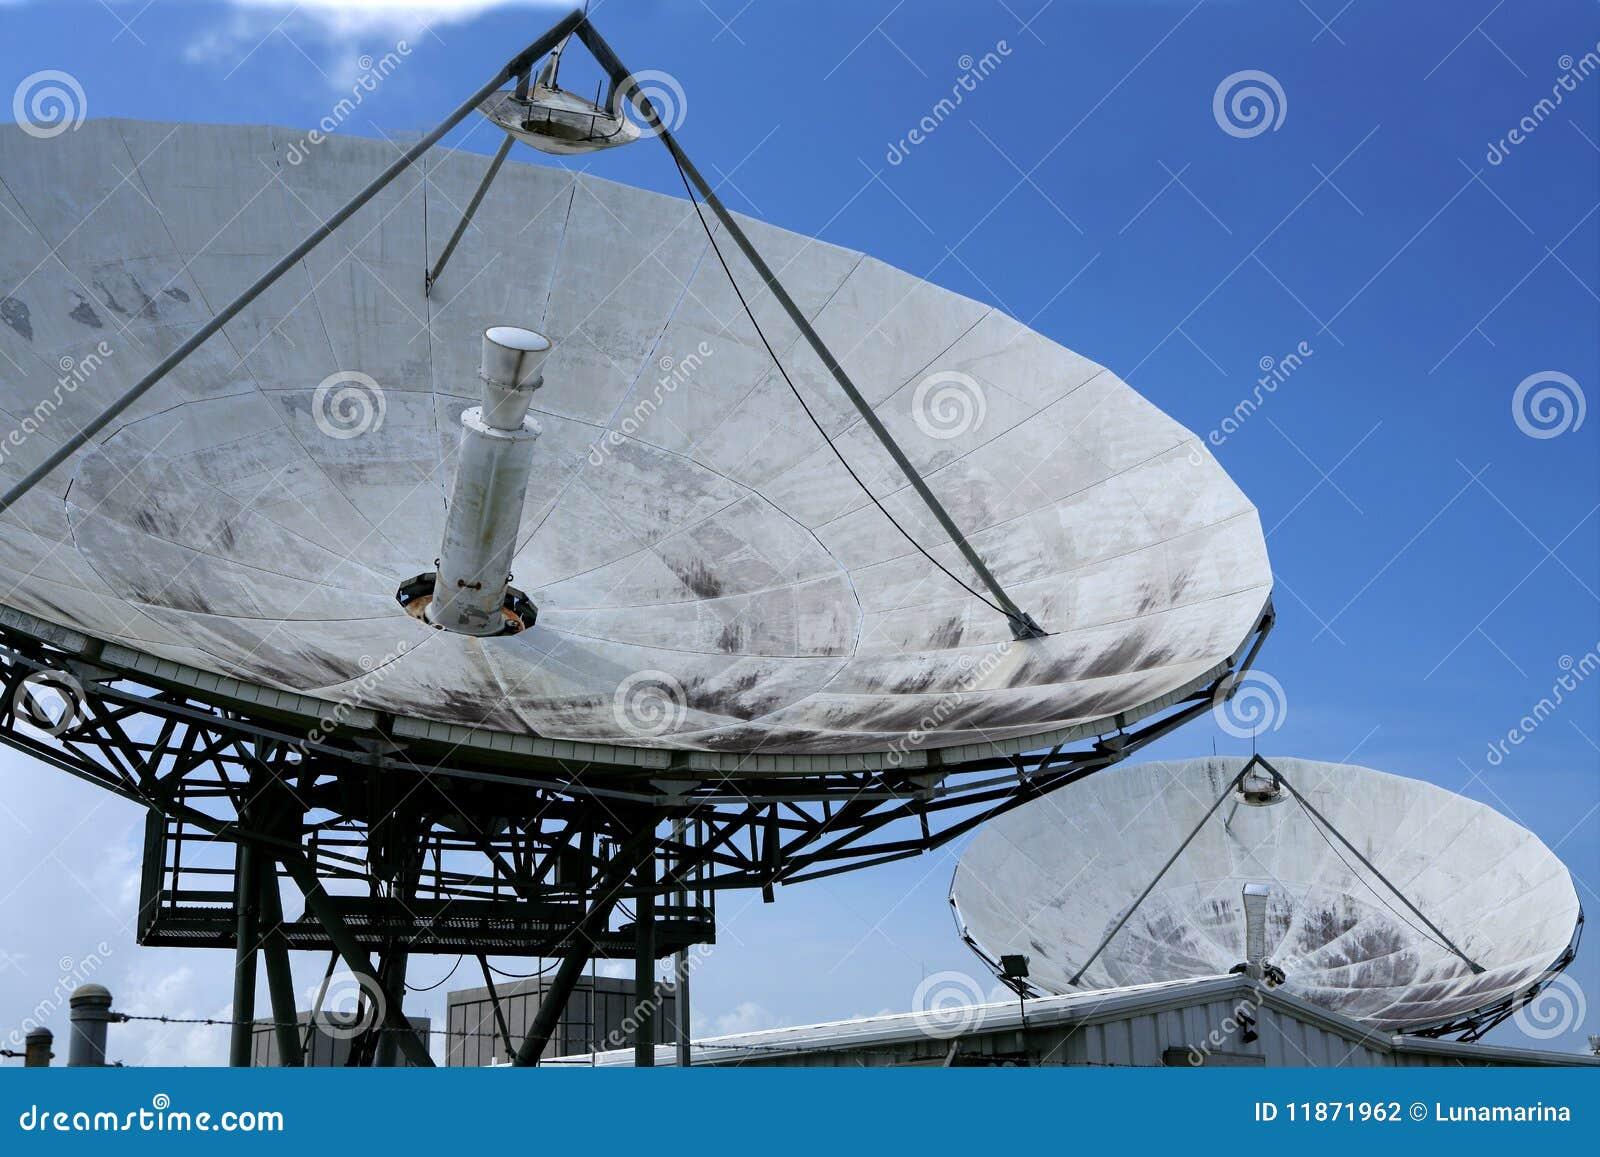 parabolic satellite dish receiver over blue sky stock photography image 11871962. Black Bedroom Furniture Sets. Home Design Ideas